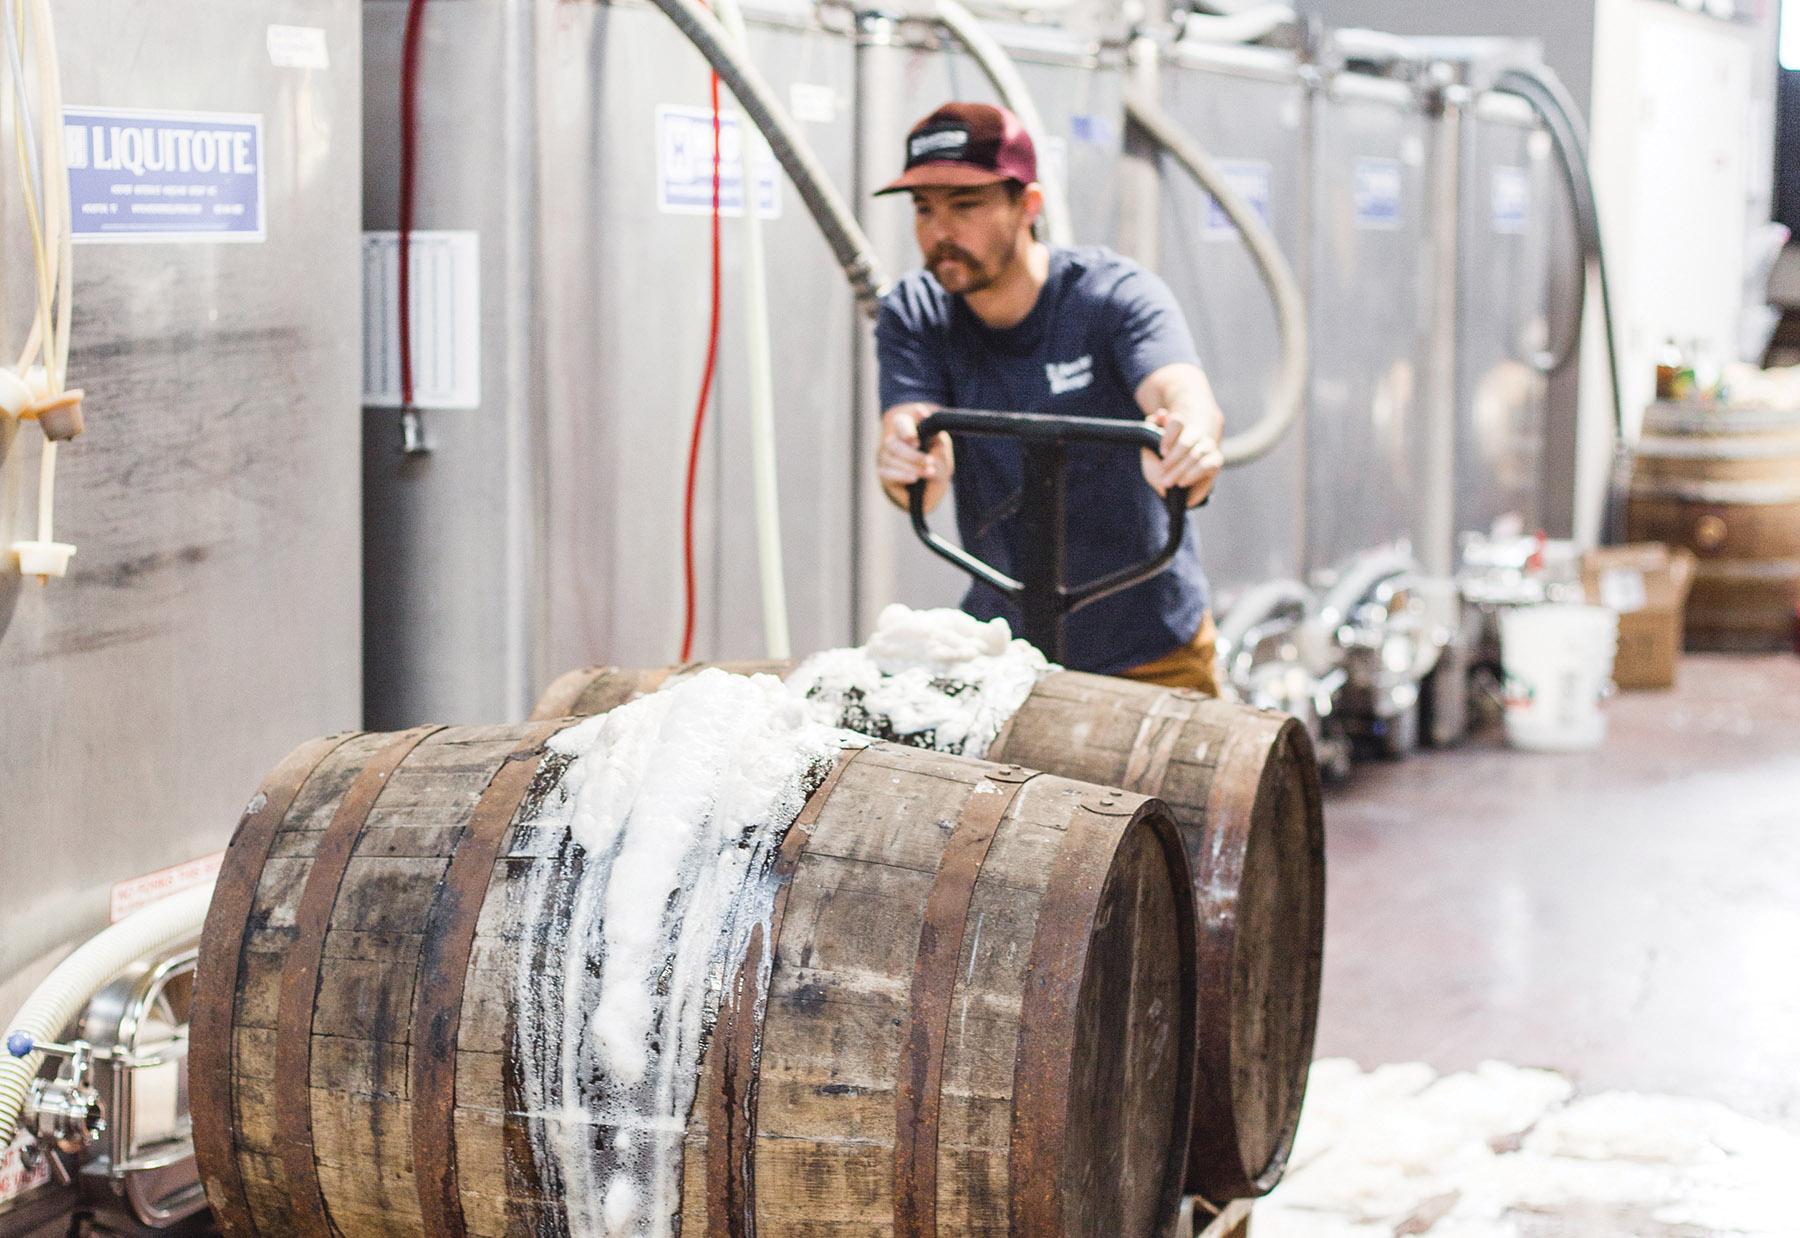 Transporting barrels at Libertine. | Photo by Jacqueline Pilar